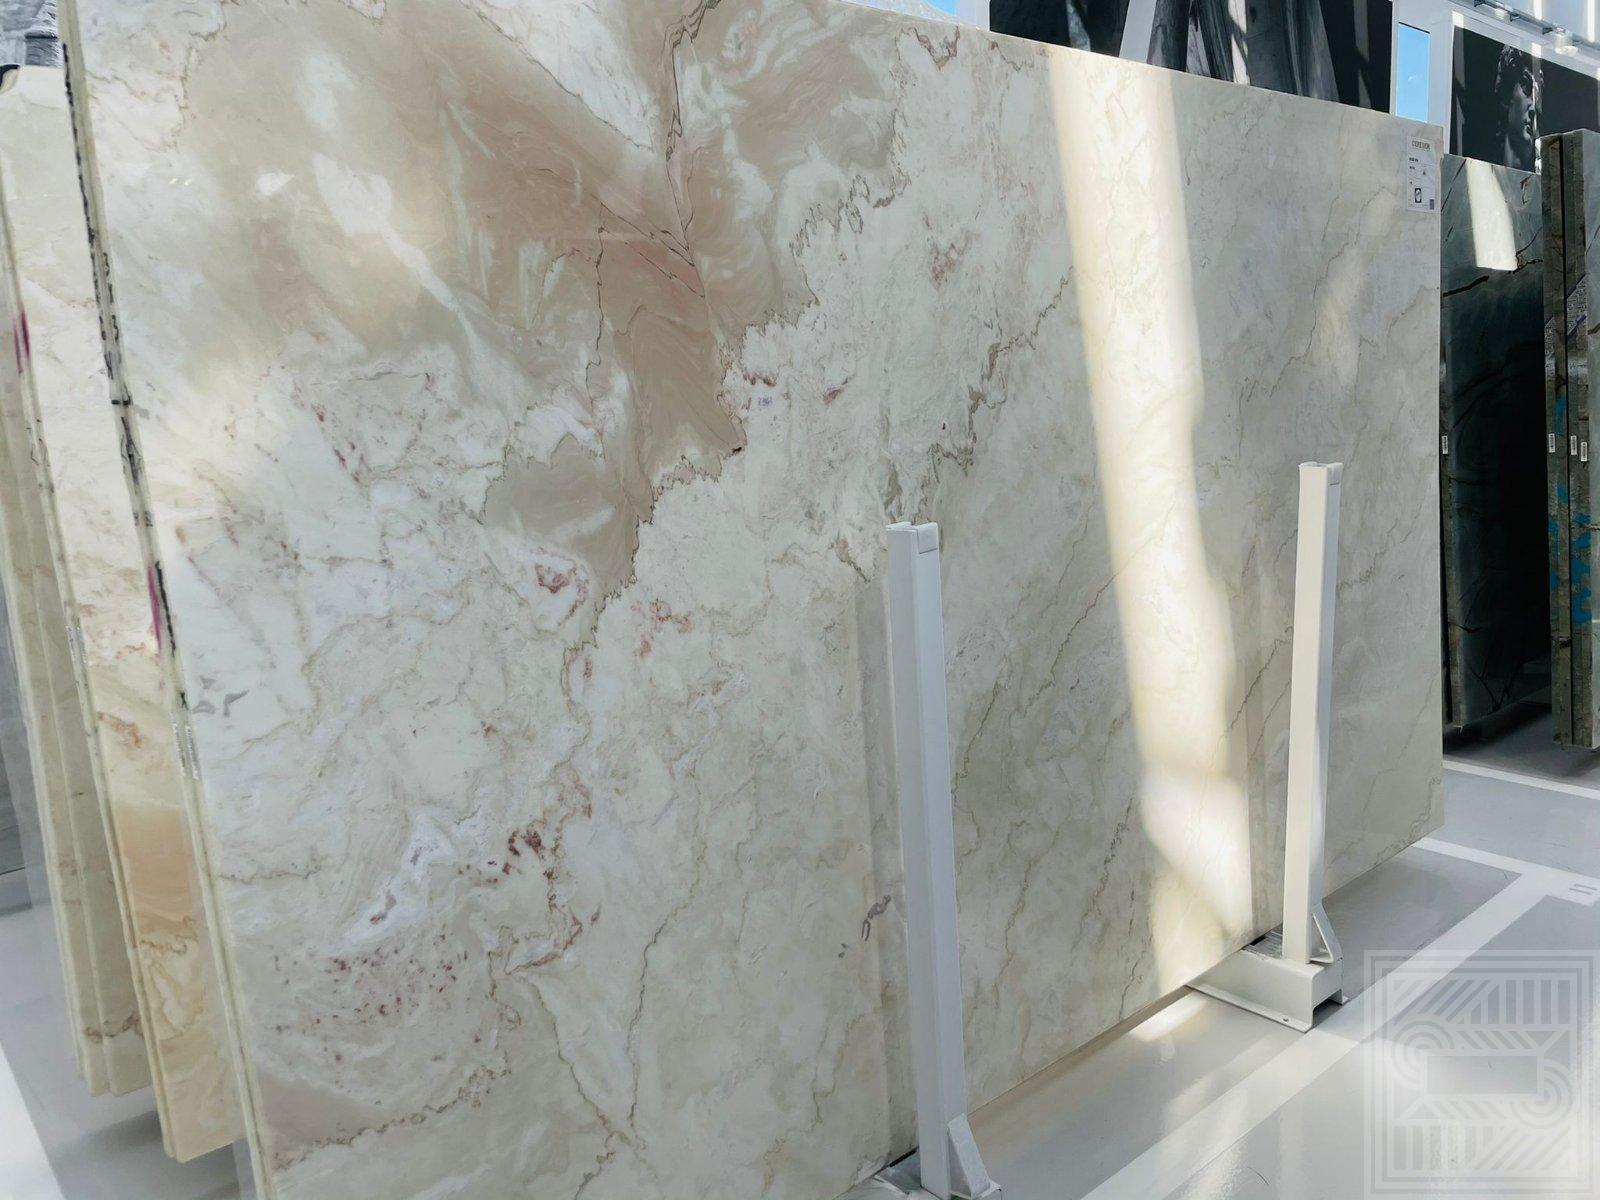 Quarzite Dolce Vita (30 mm) natural-quartzite - Quarzite Dolce Vita 2 1